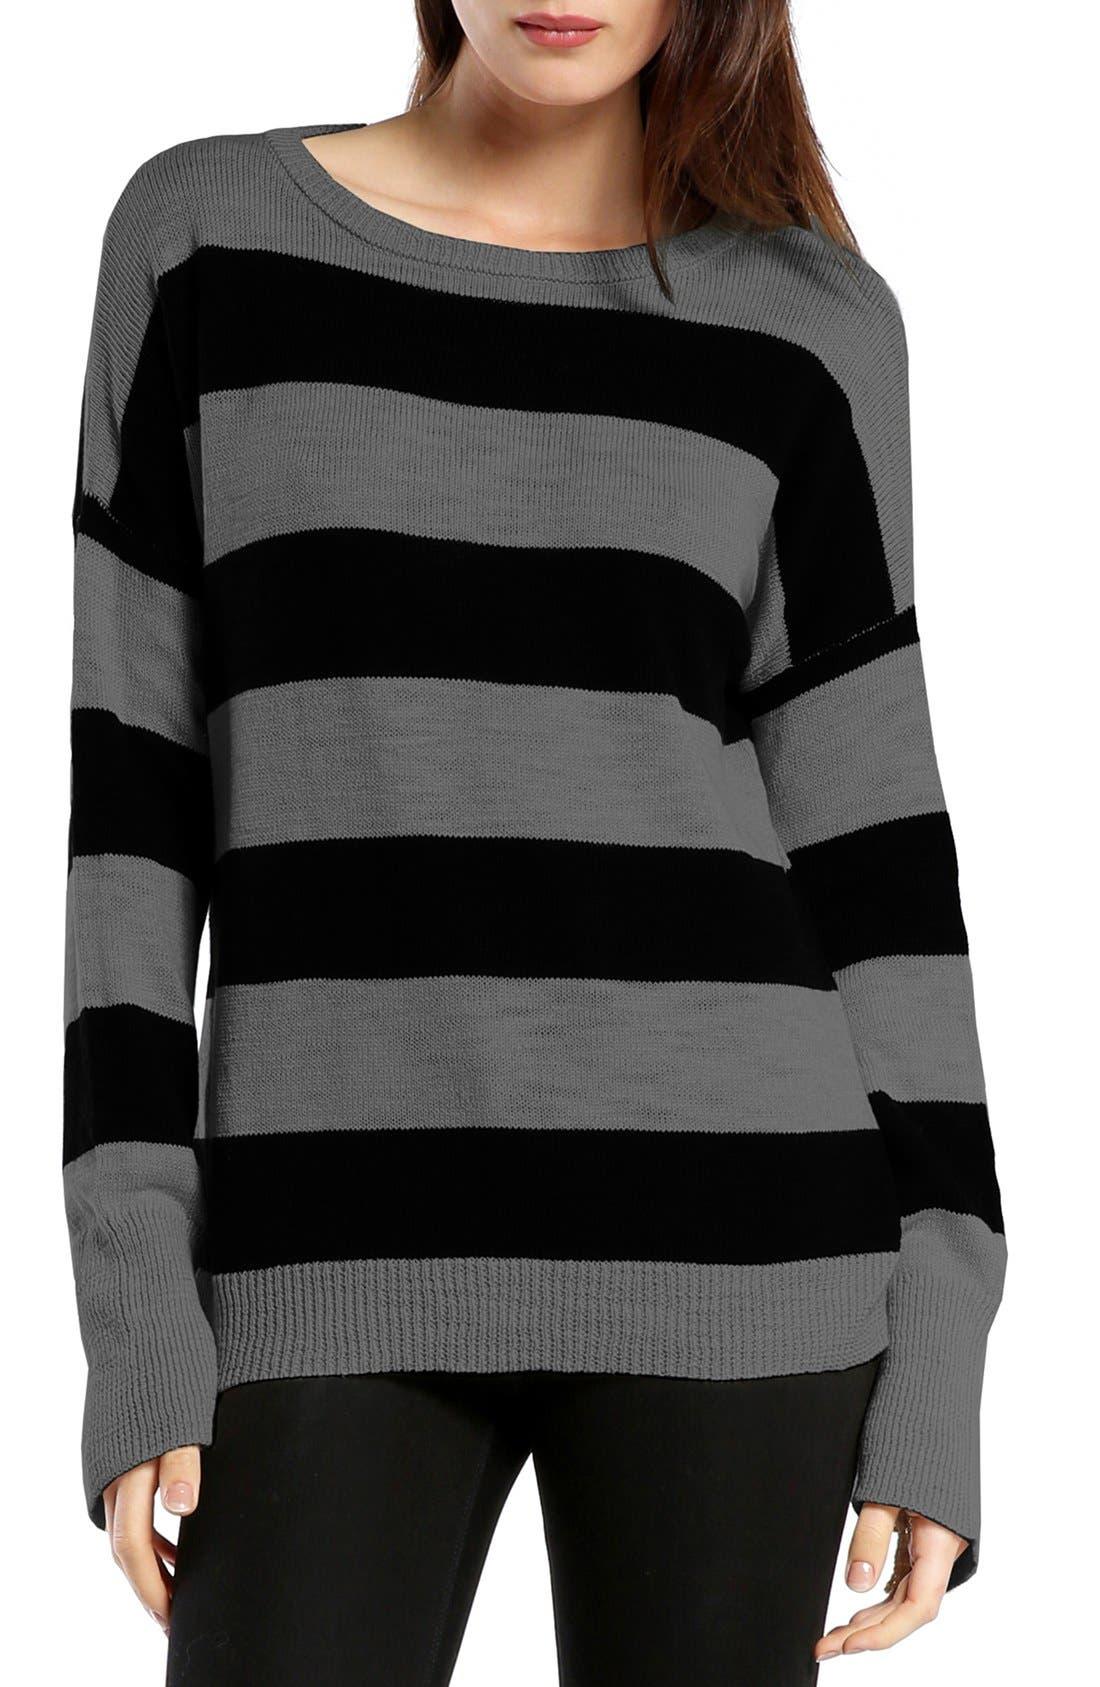 MICHAEL STARS,                             Side Zip Stripe Boatneck Top,                             Main thumbnail 1, color,                             055